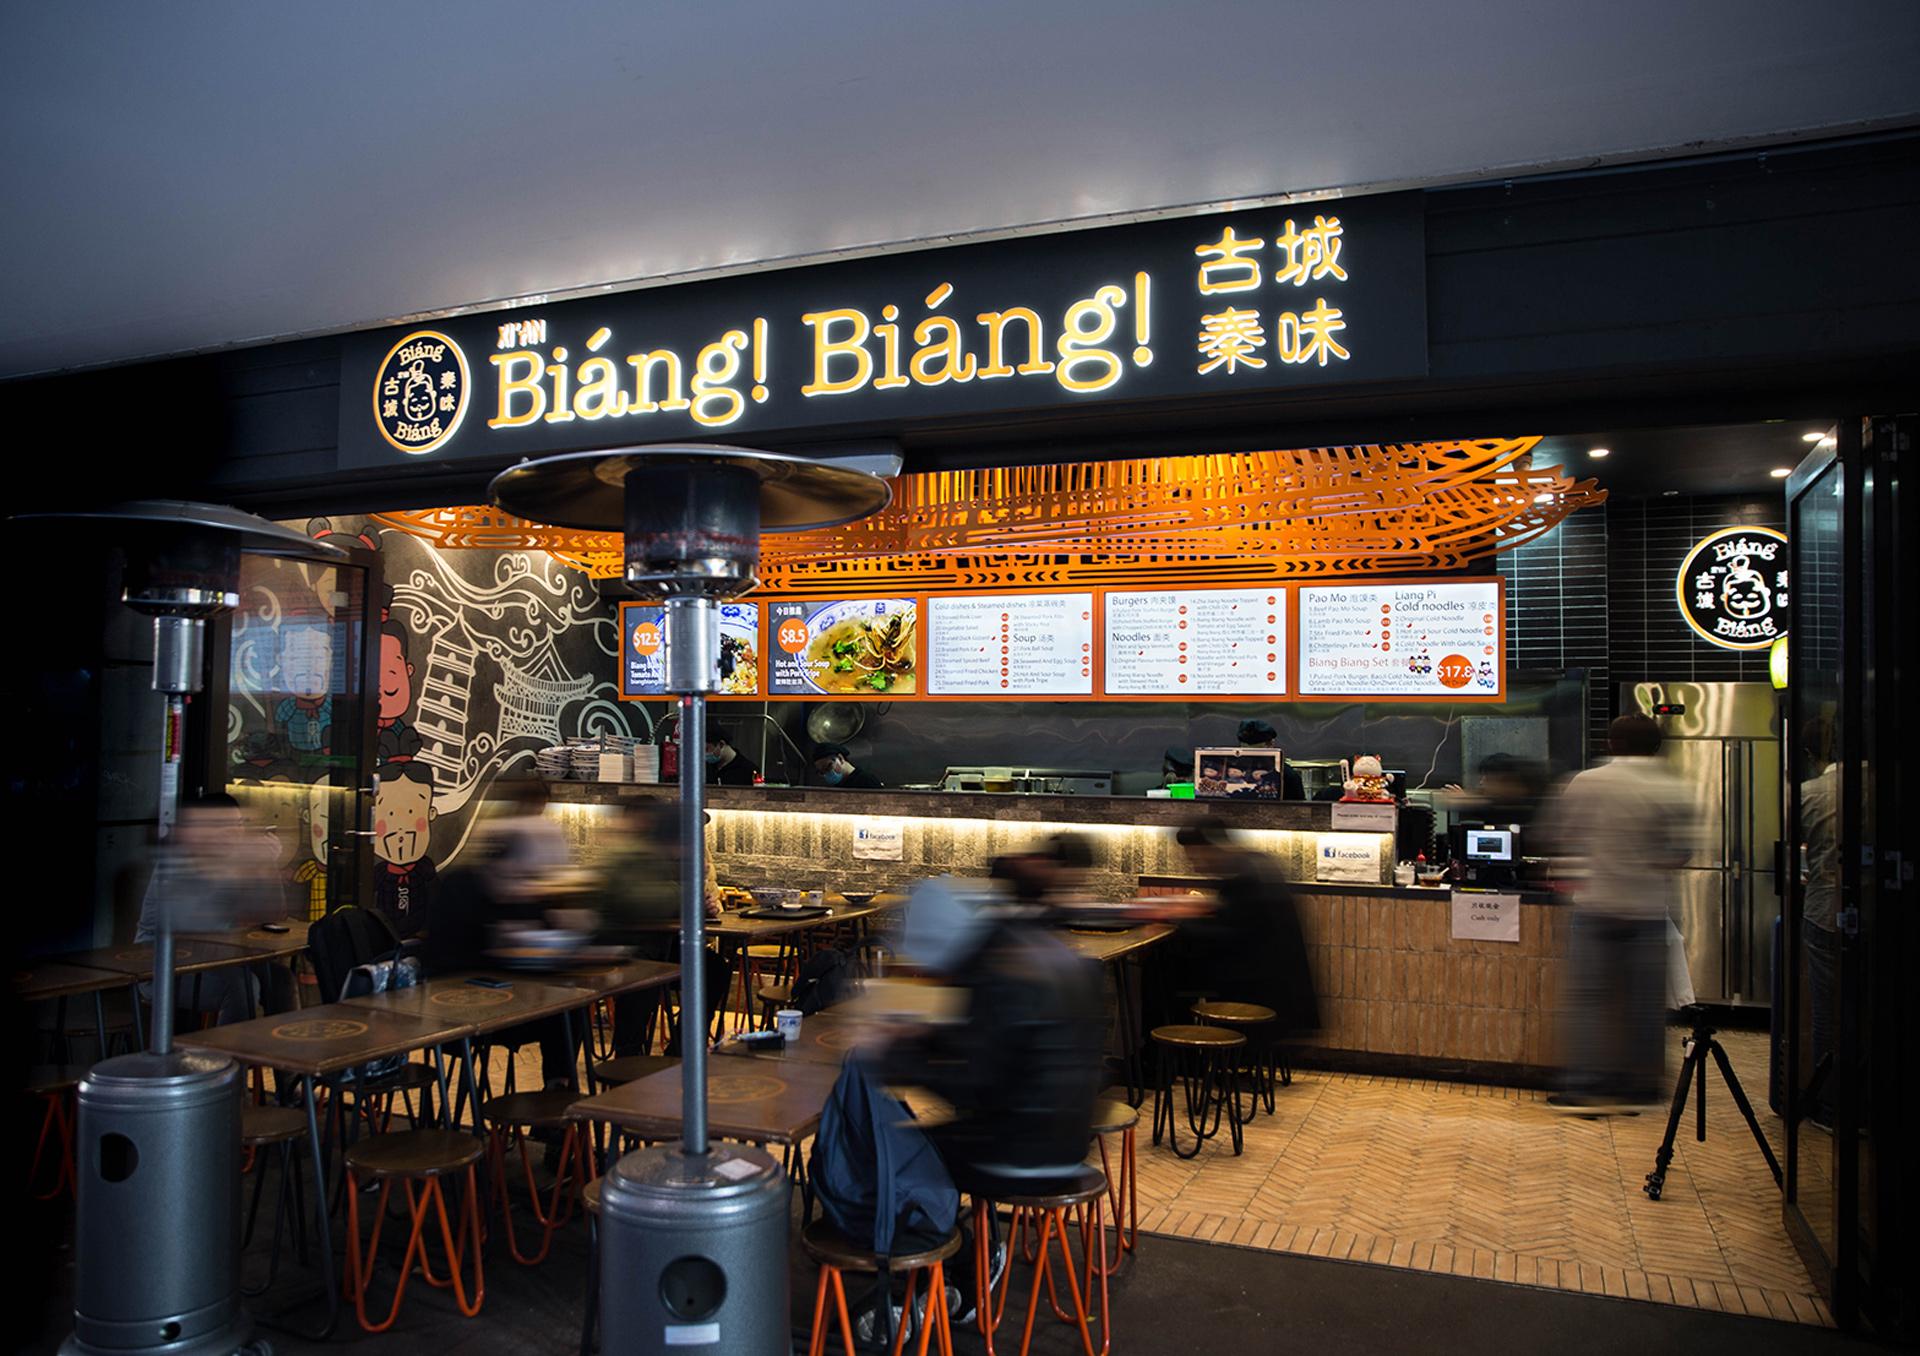 biangbiang_1